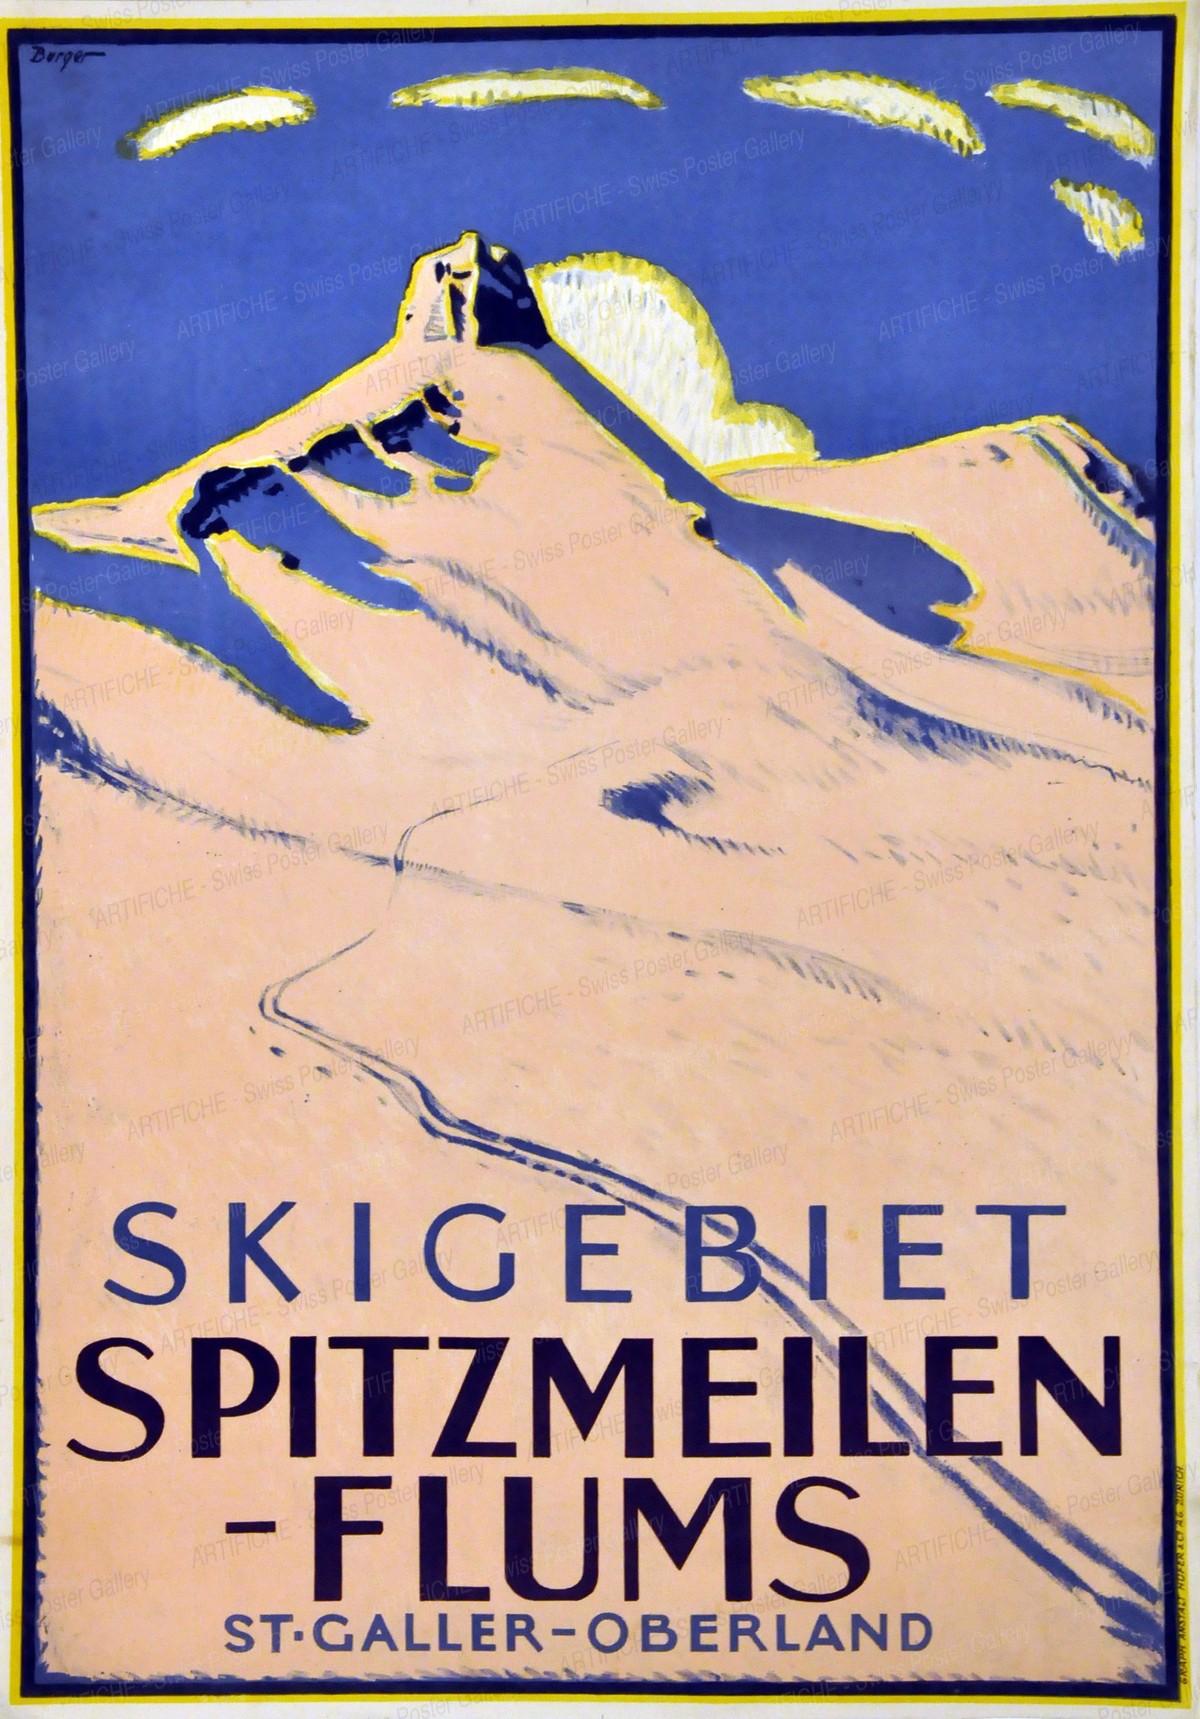 Skigebiet Spitzmeilen – Flums St. Galler – Oberland, Wilhelm Friedrich Burger